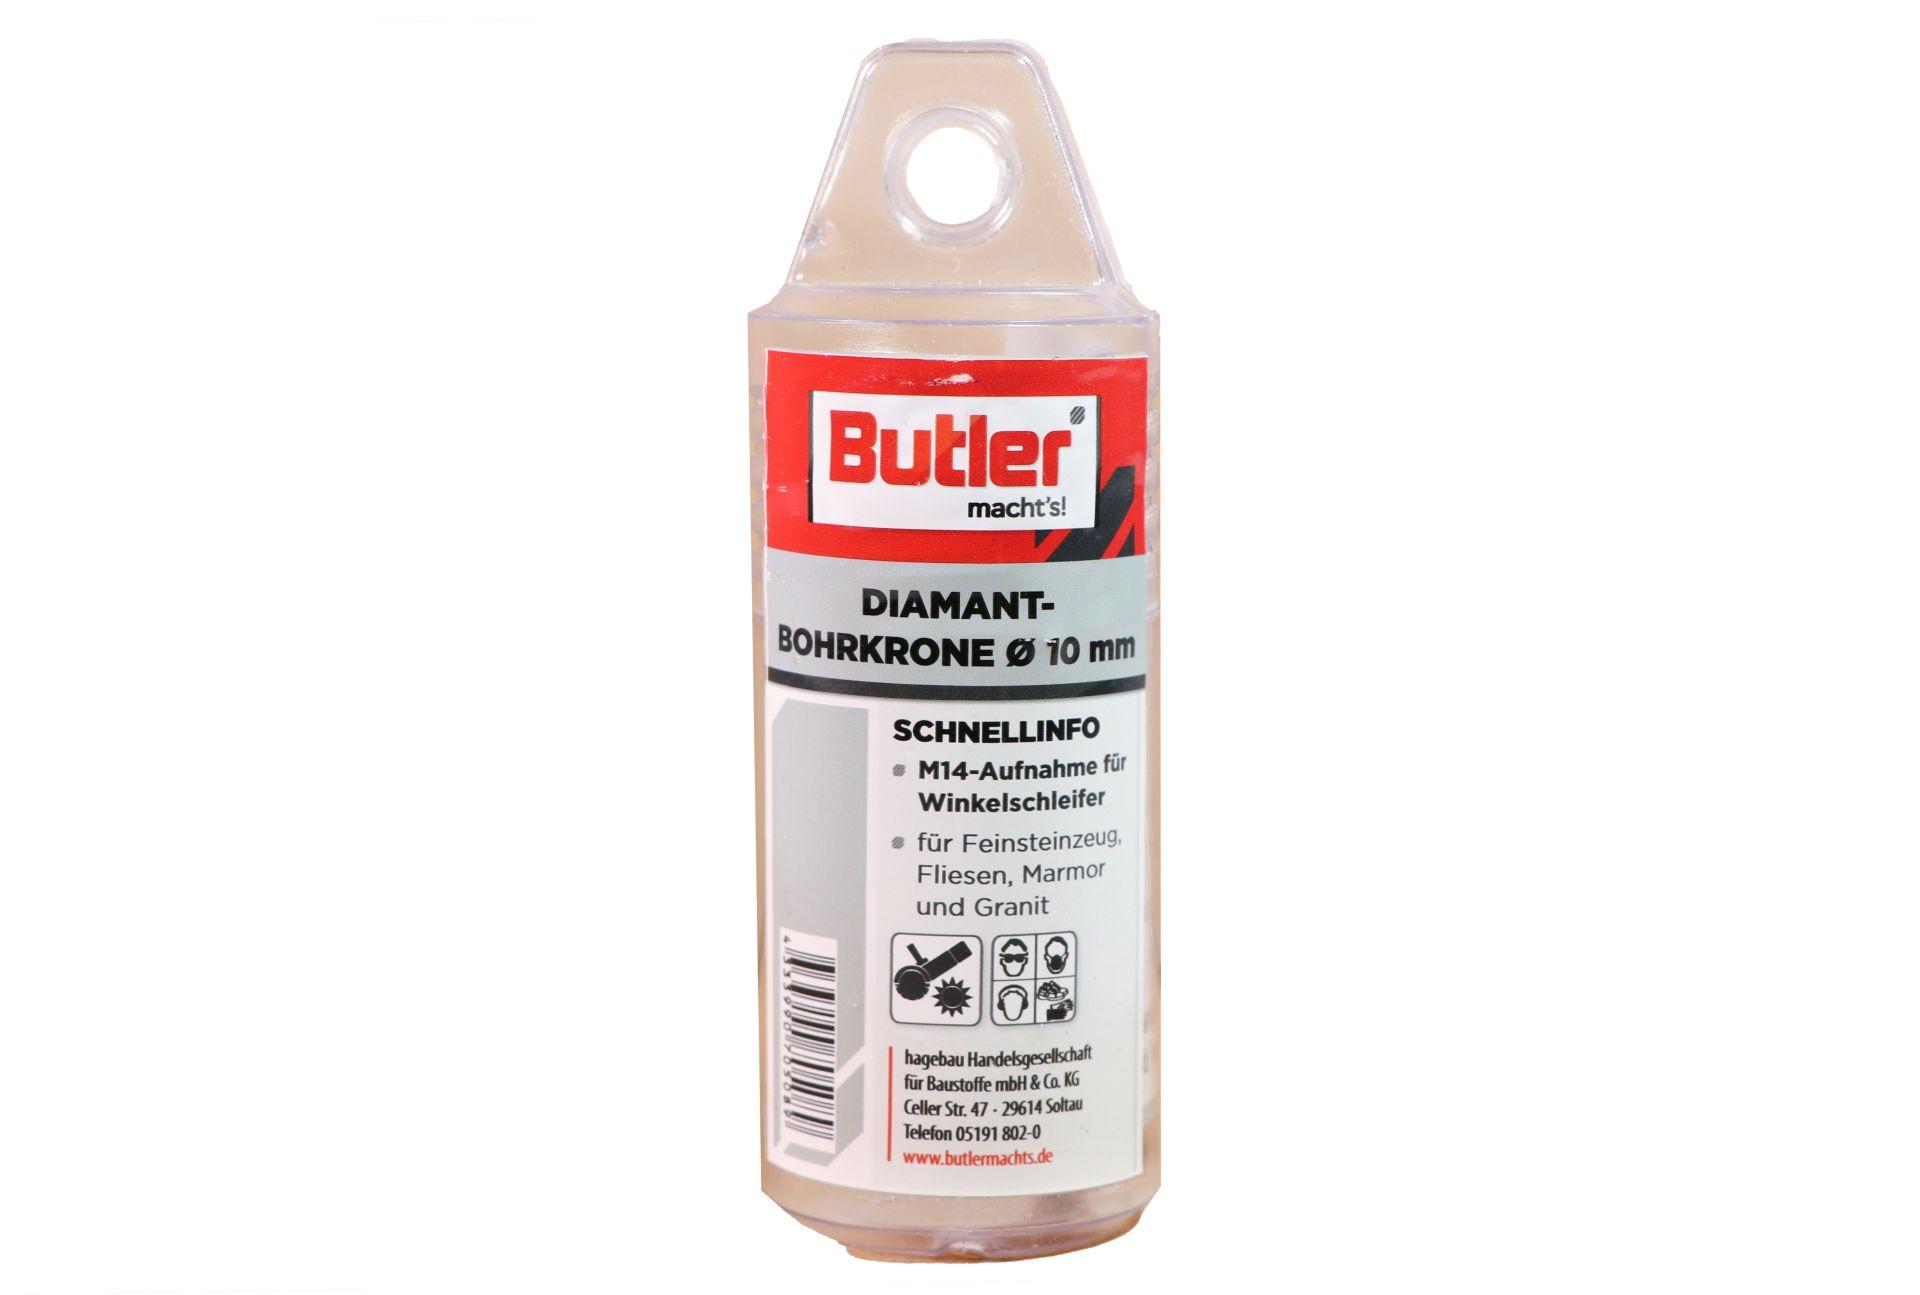 Butler macht's! Diamant-Bohrkrone, Ø 10 mm, Aufnahme M14, Bohrtiefe 35 mm